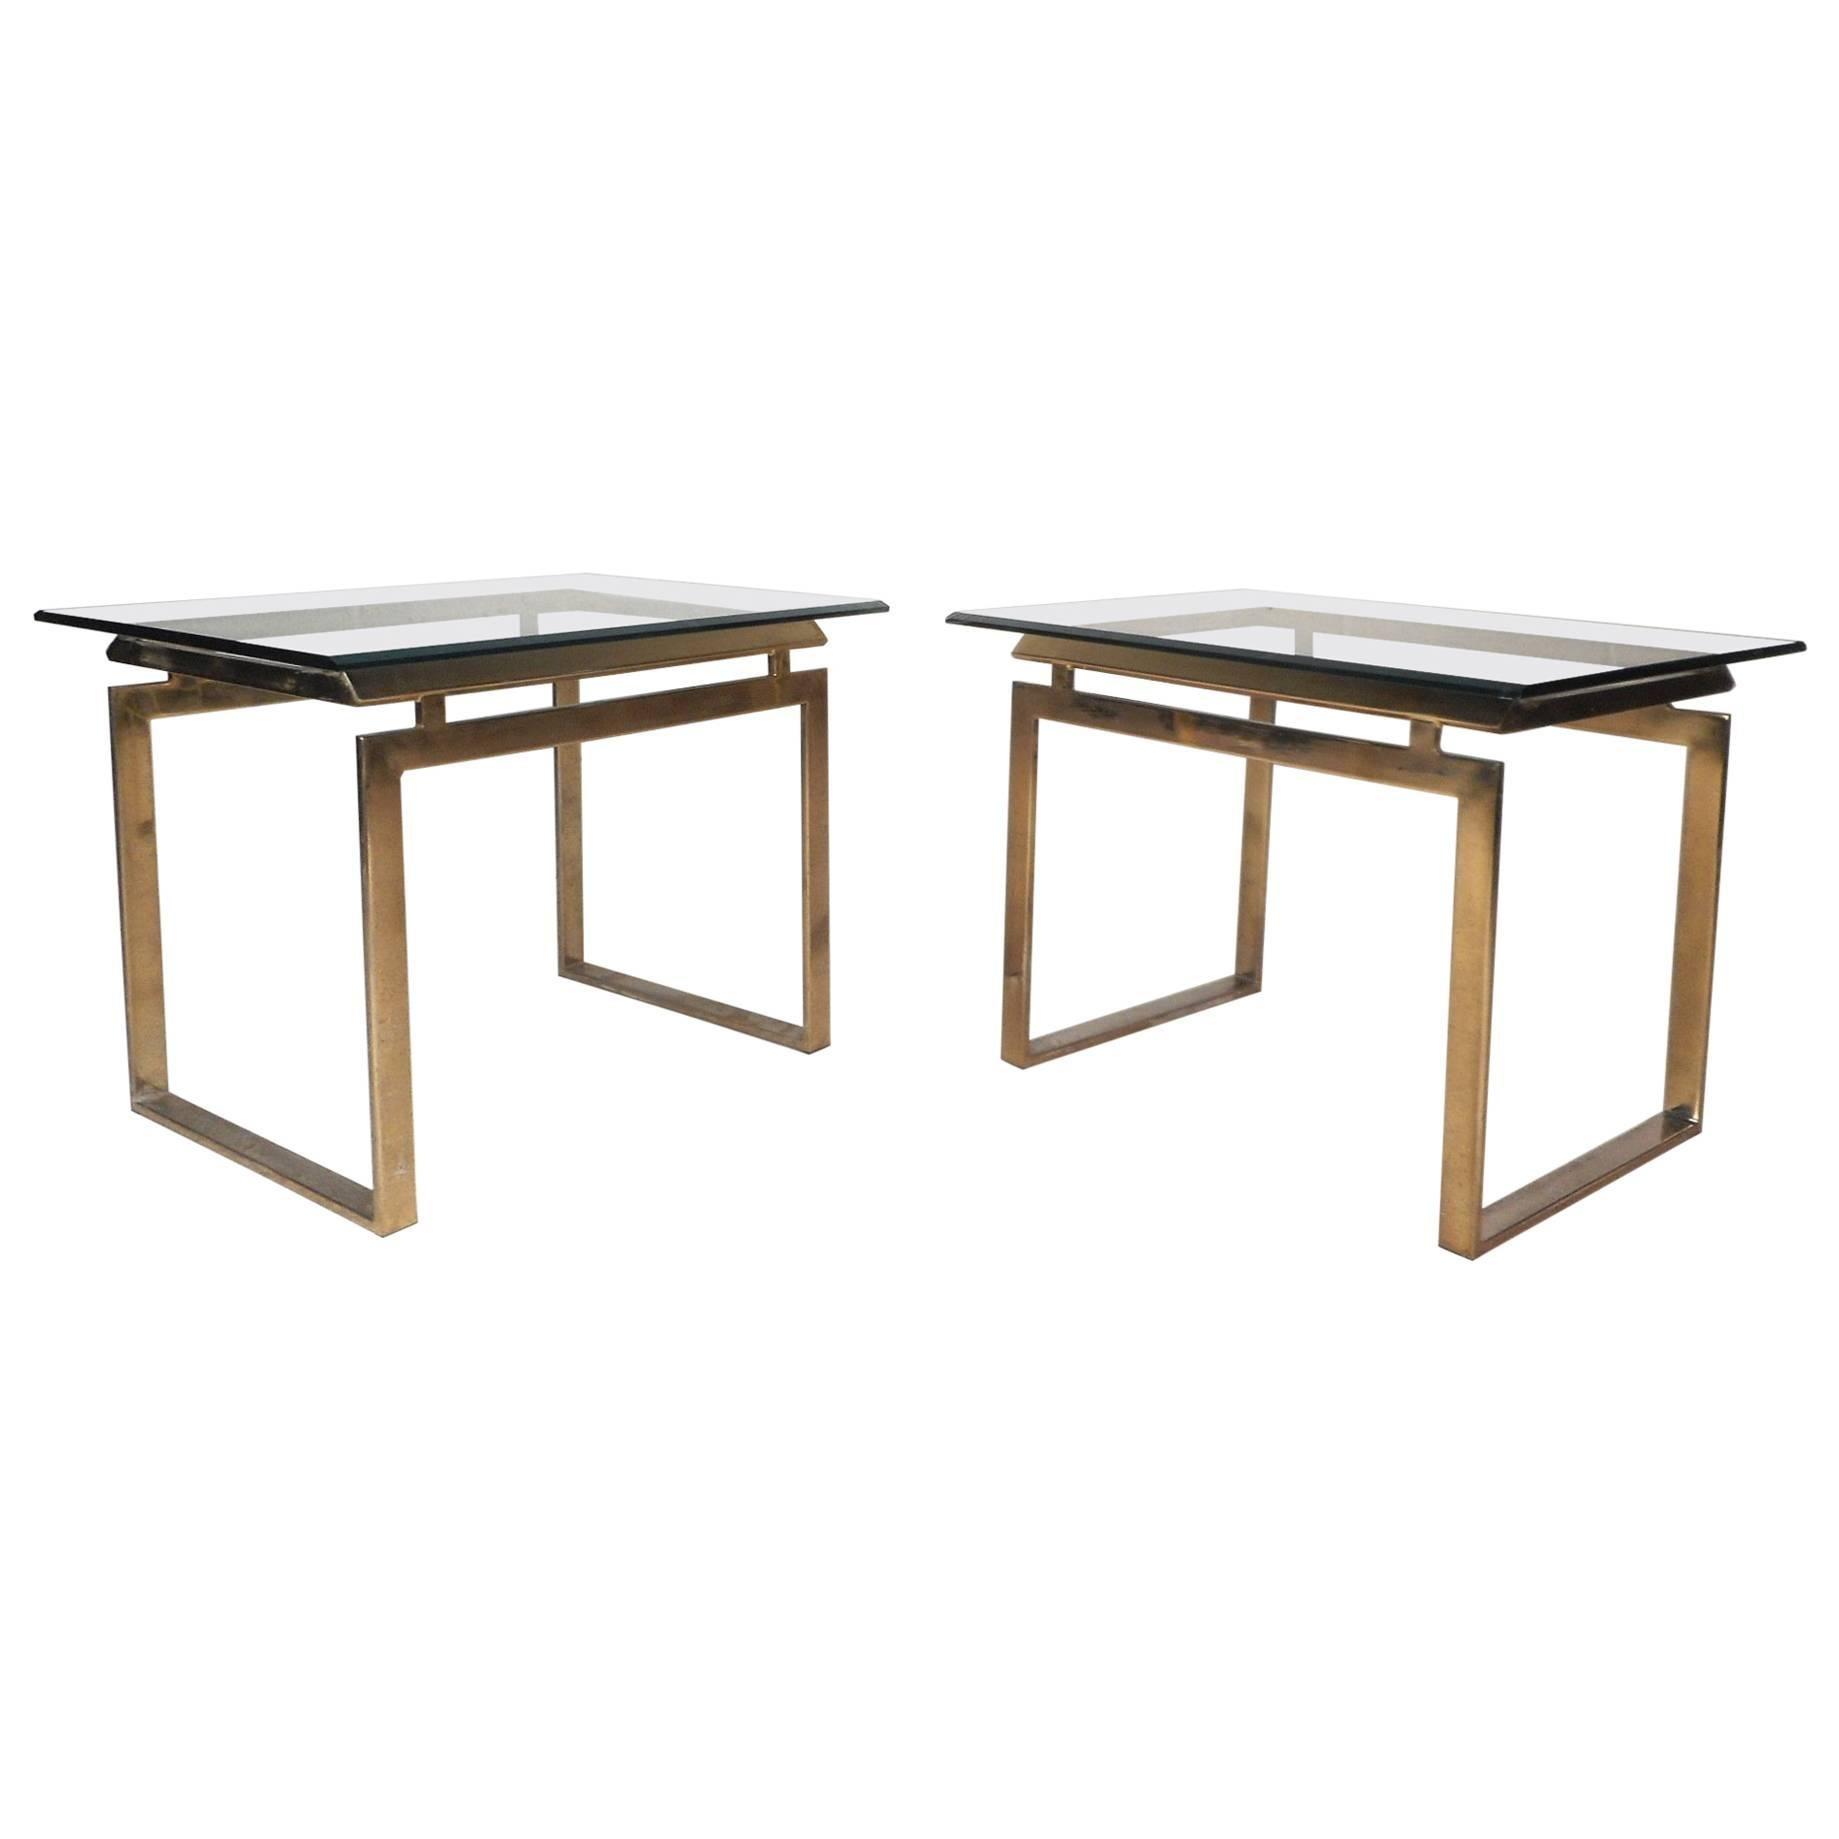 Pair of Mid-Century Modern Sled Leg End Tables